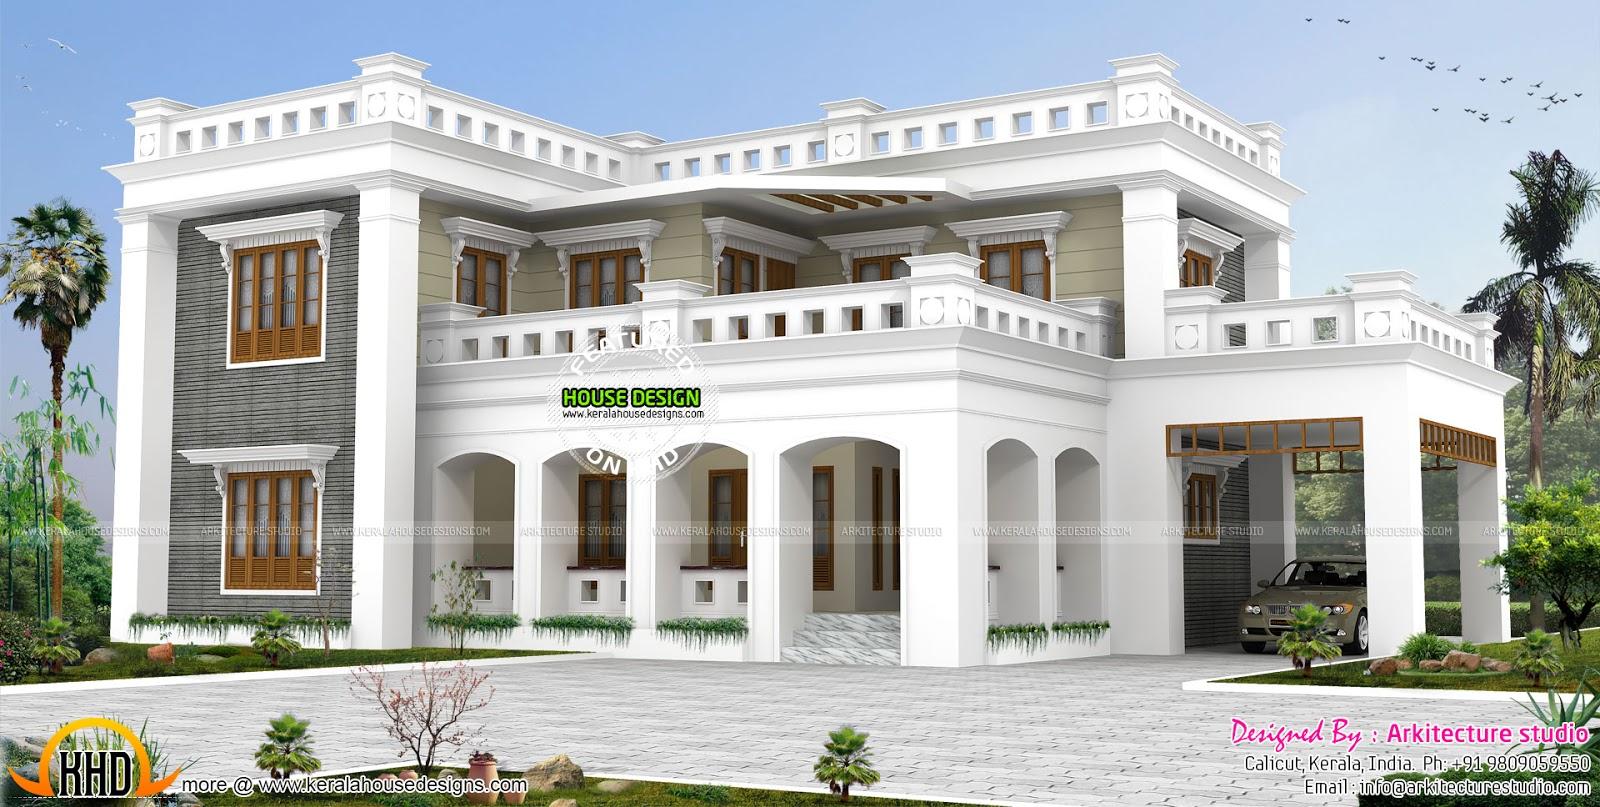 Decorative Flat Roof : Decorative style bhk flat roof home kerala design